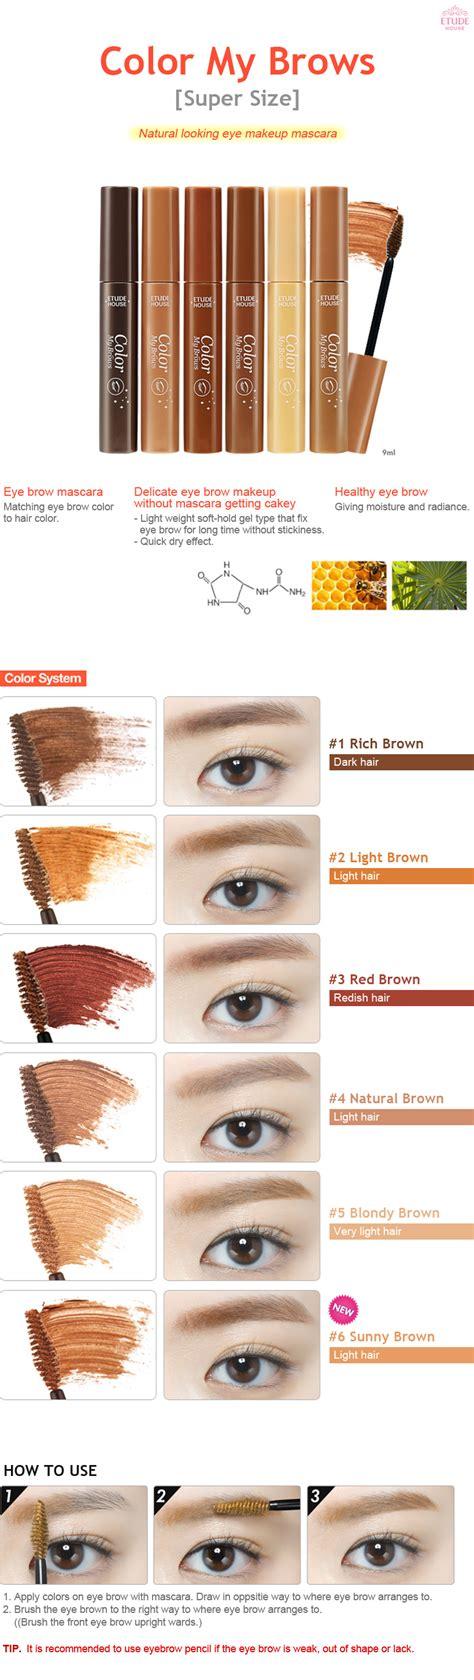 Q1 Etude House Color My Brow etude house color my brows size 6 color 9ml eye brow mascara ebay